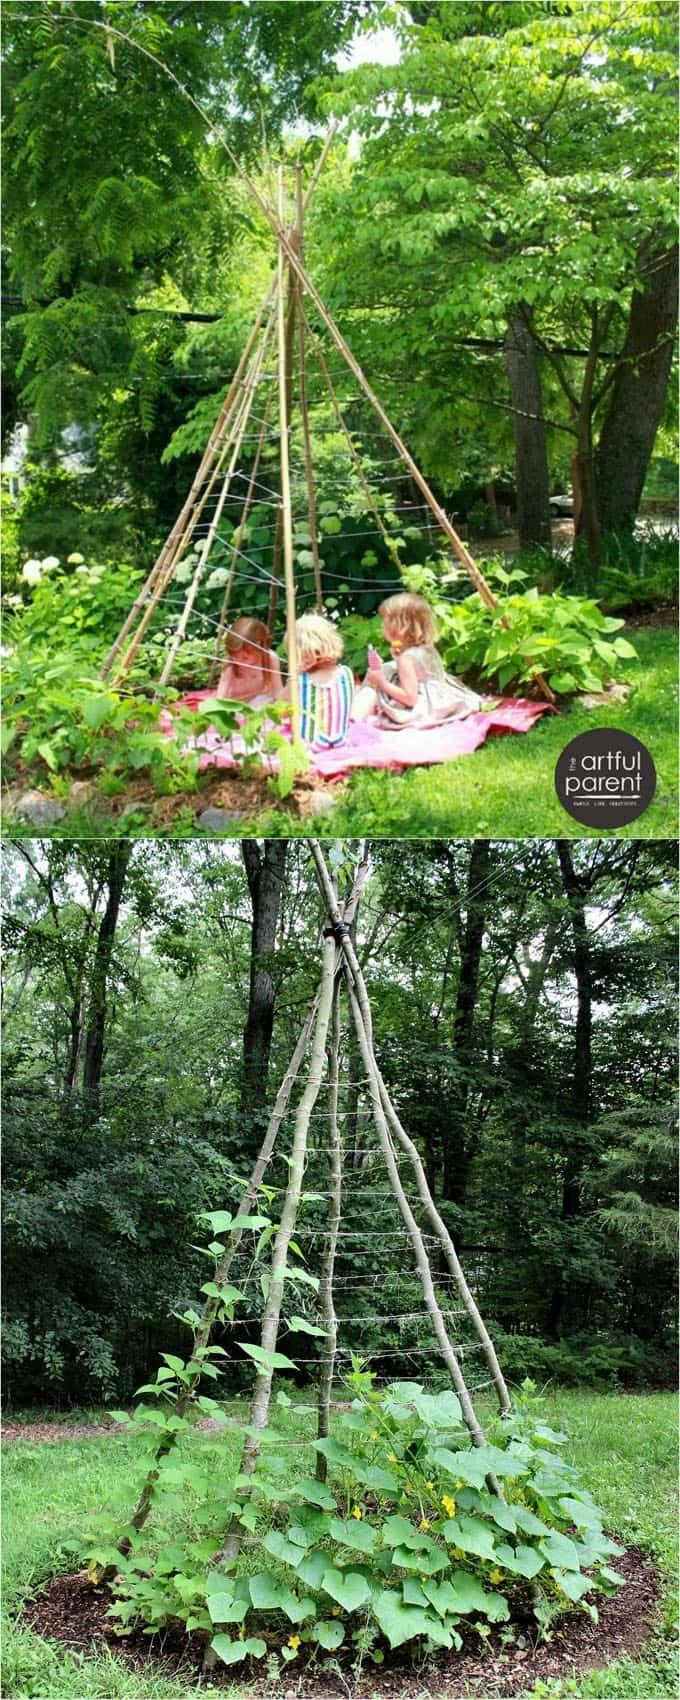 Veggie garden inspiration   Easy DIY Trellis u Vertical Garden Structures  Garden structures